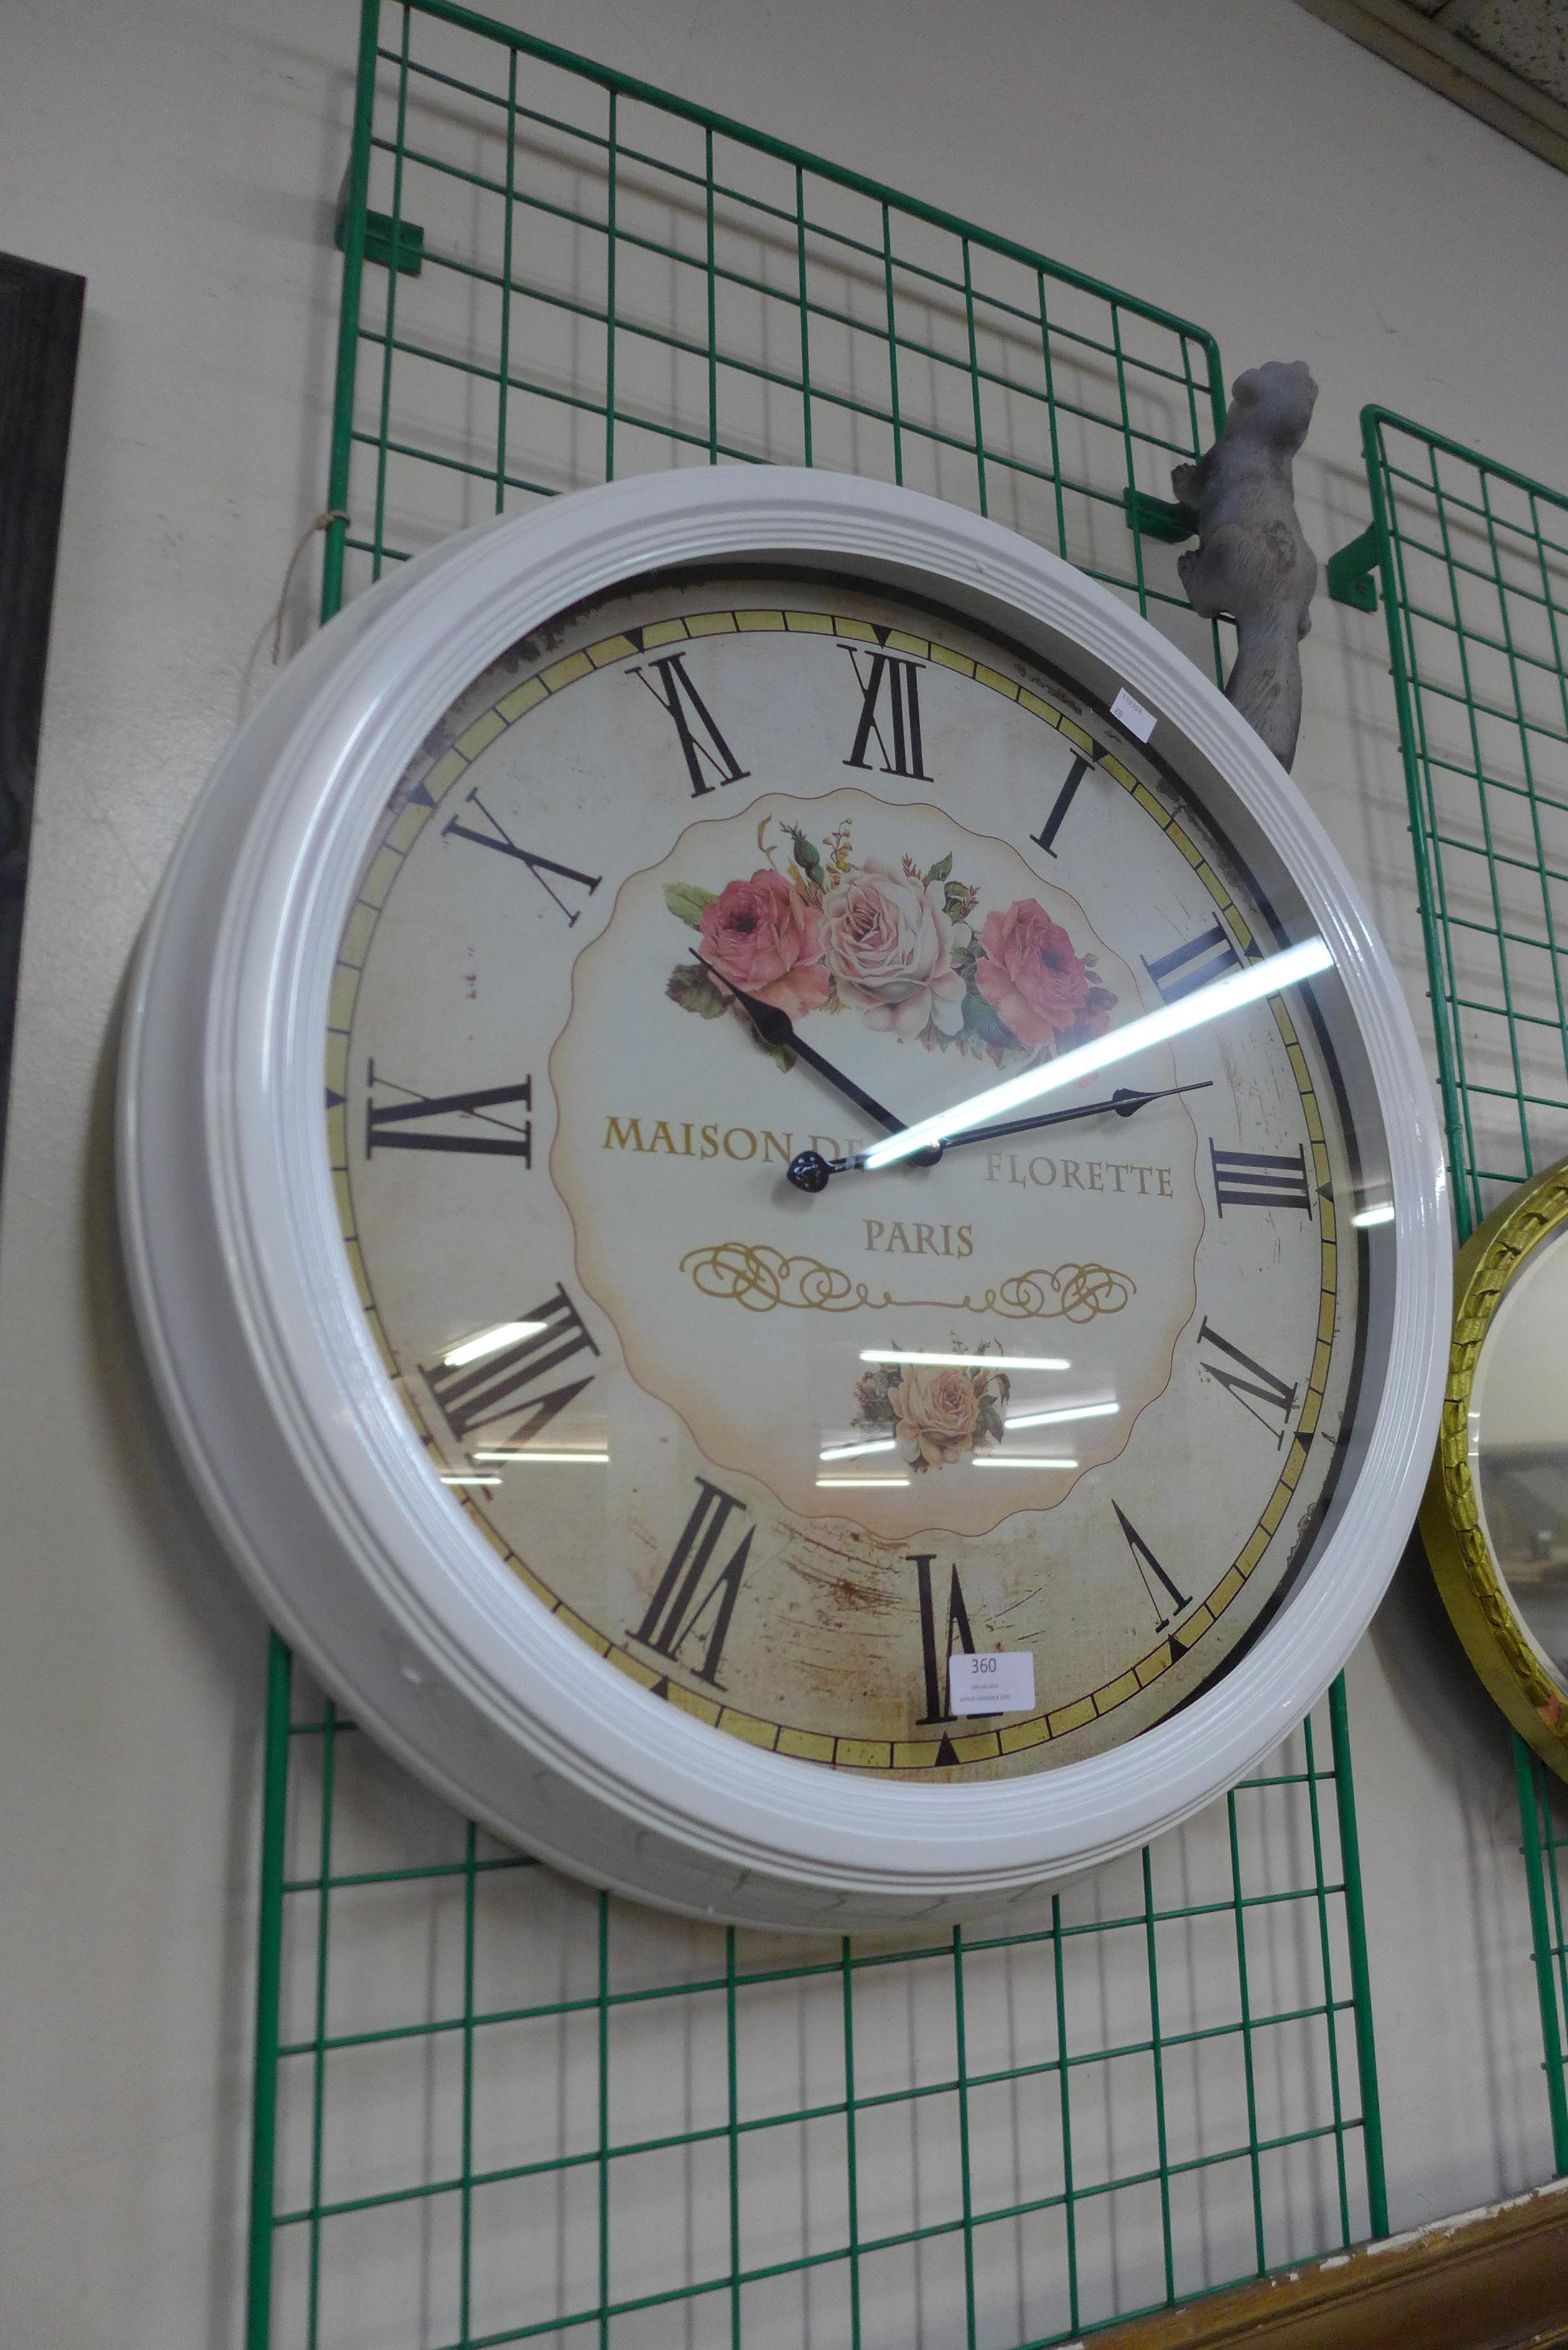 A French style circular wall clock